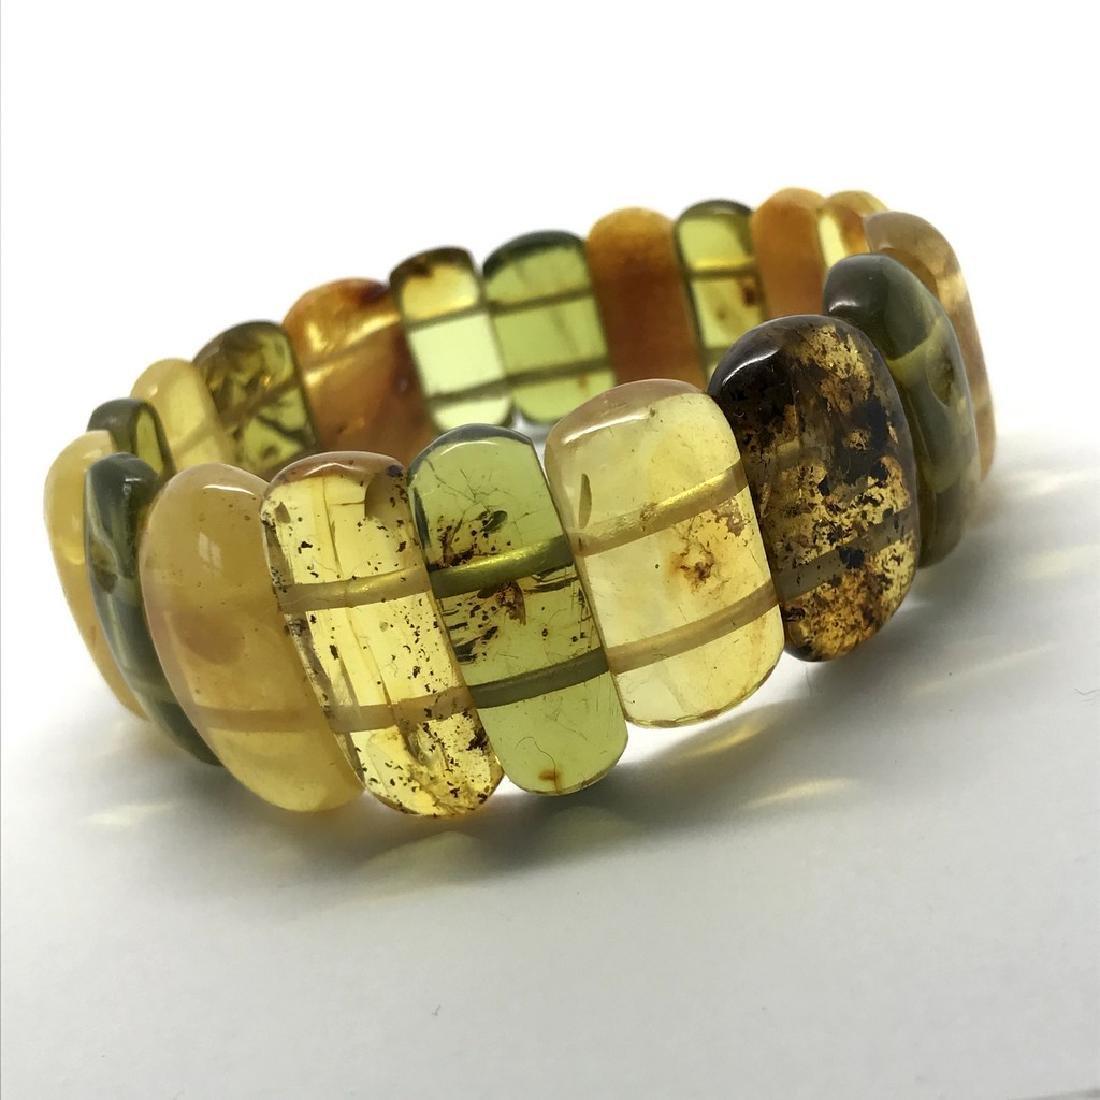 Vintage Bracelet Baltic amber cut cabochons, 19.7 grams - 3